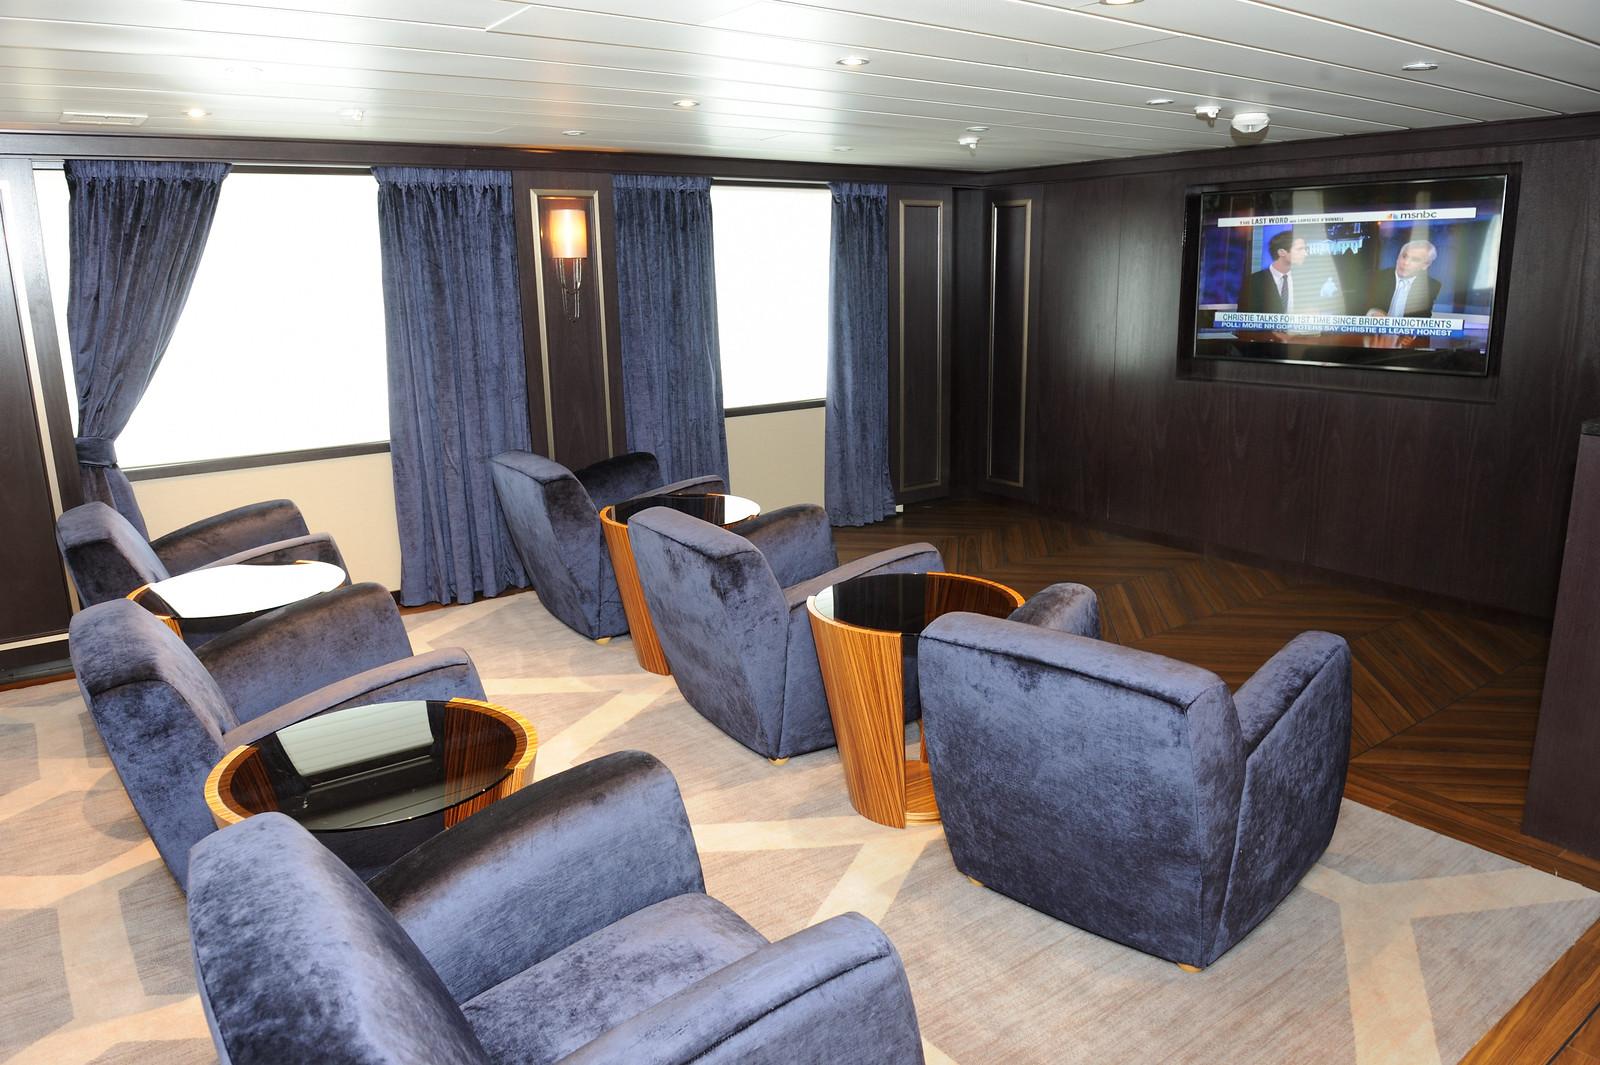 Windstar Star Breeze Interior Screening Room 7.jpeg